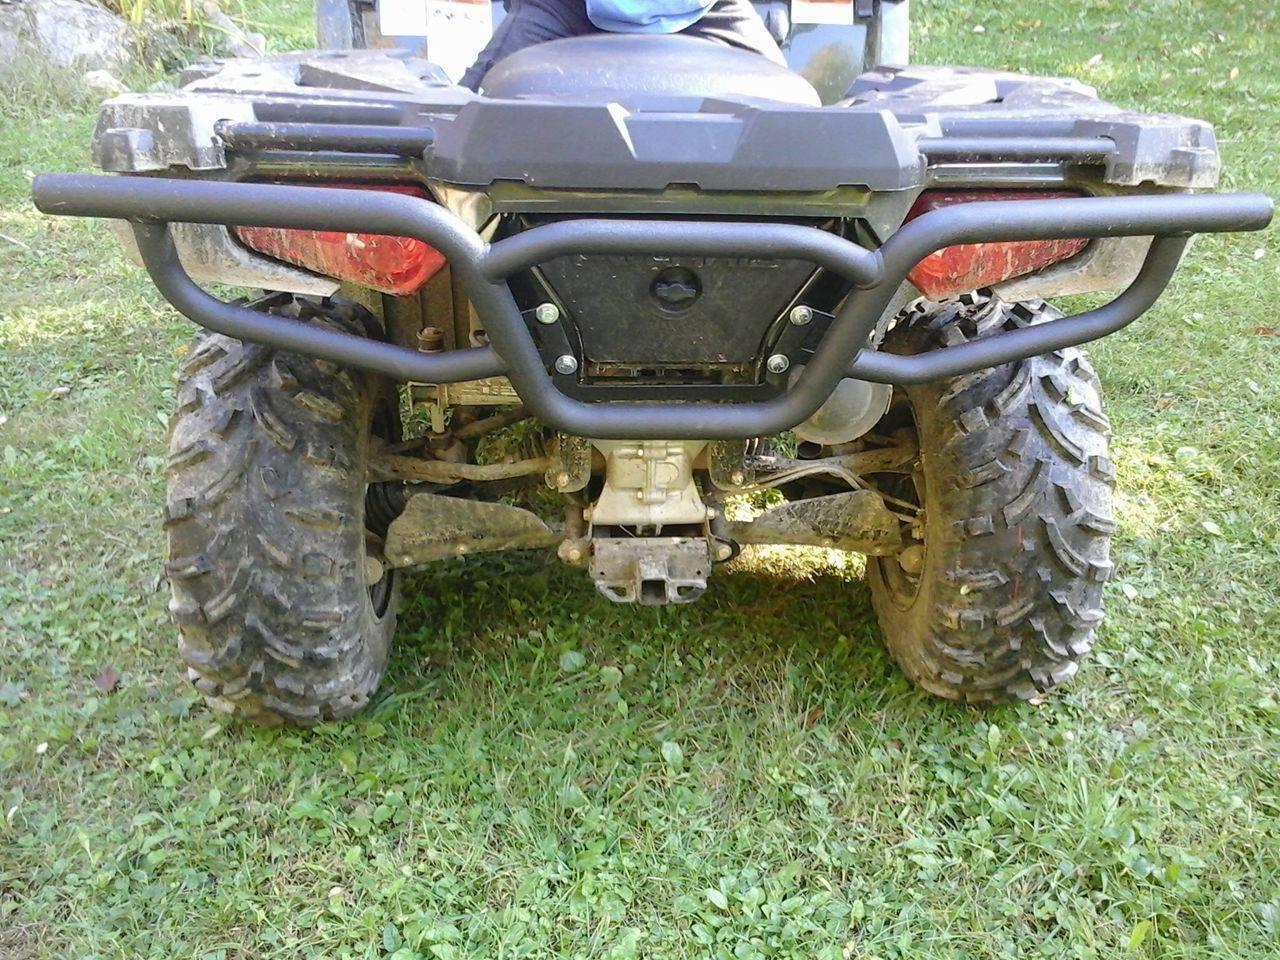 Polaris Sportsman 400 450 500 570 800 (2011-2019) Quad ATV Bison Rear  Bumper Brush Guard